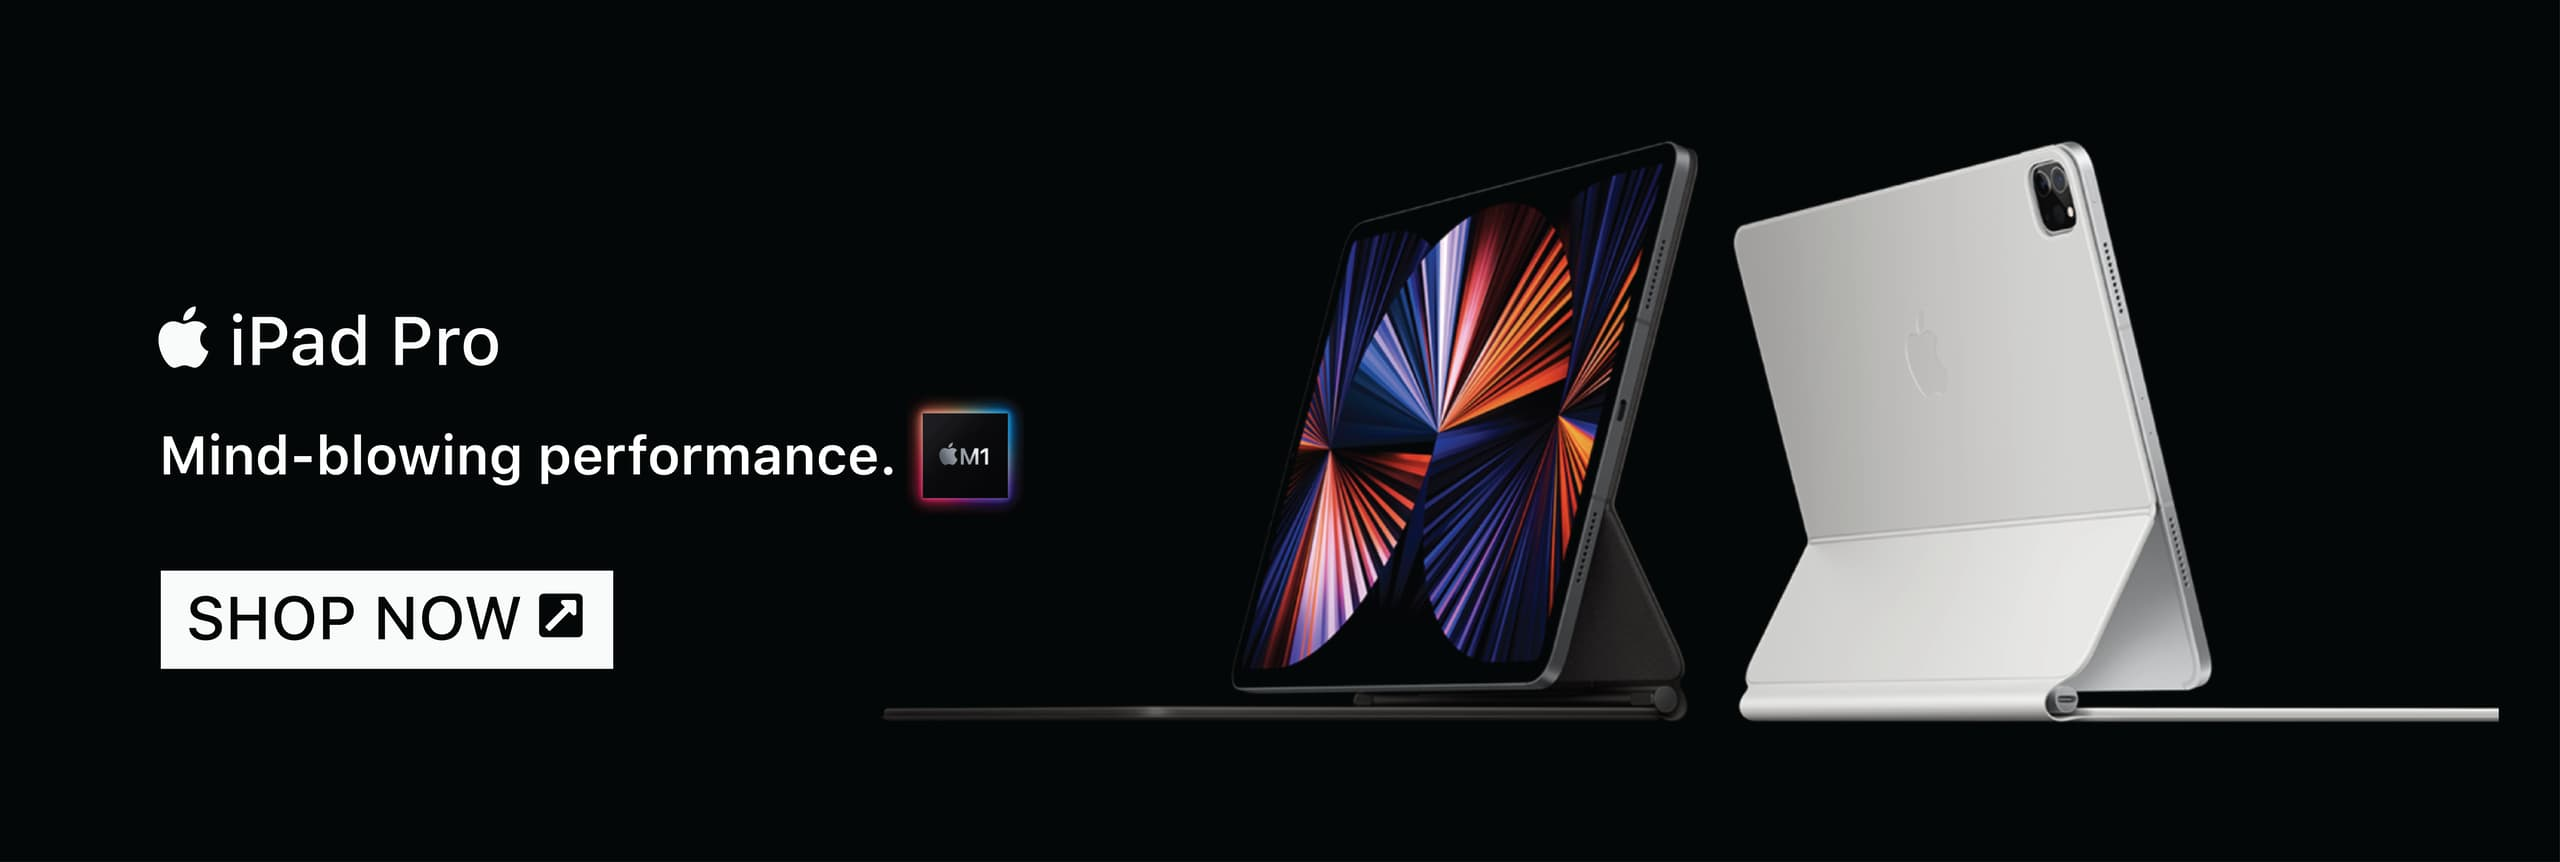 iPad Pro M1 Chip 2021